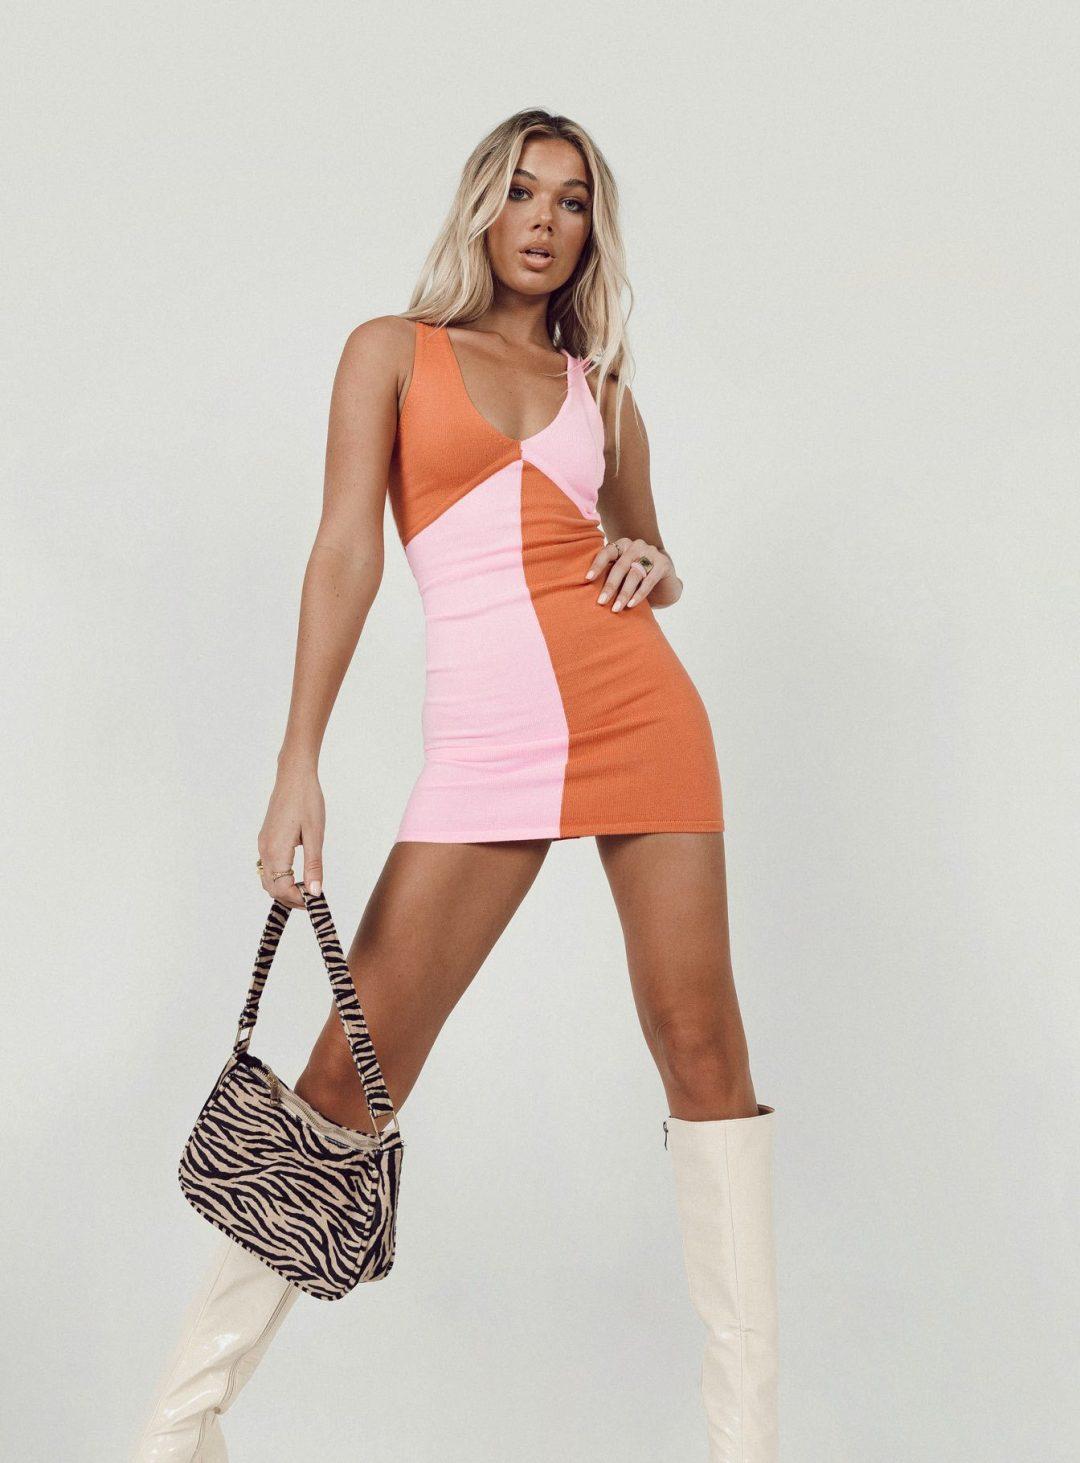 Pink and bur t orange color block dress